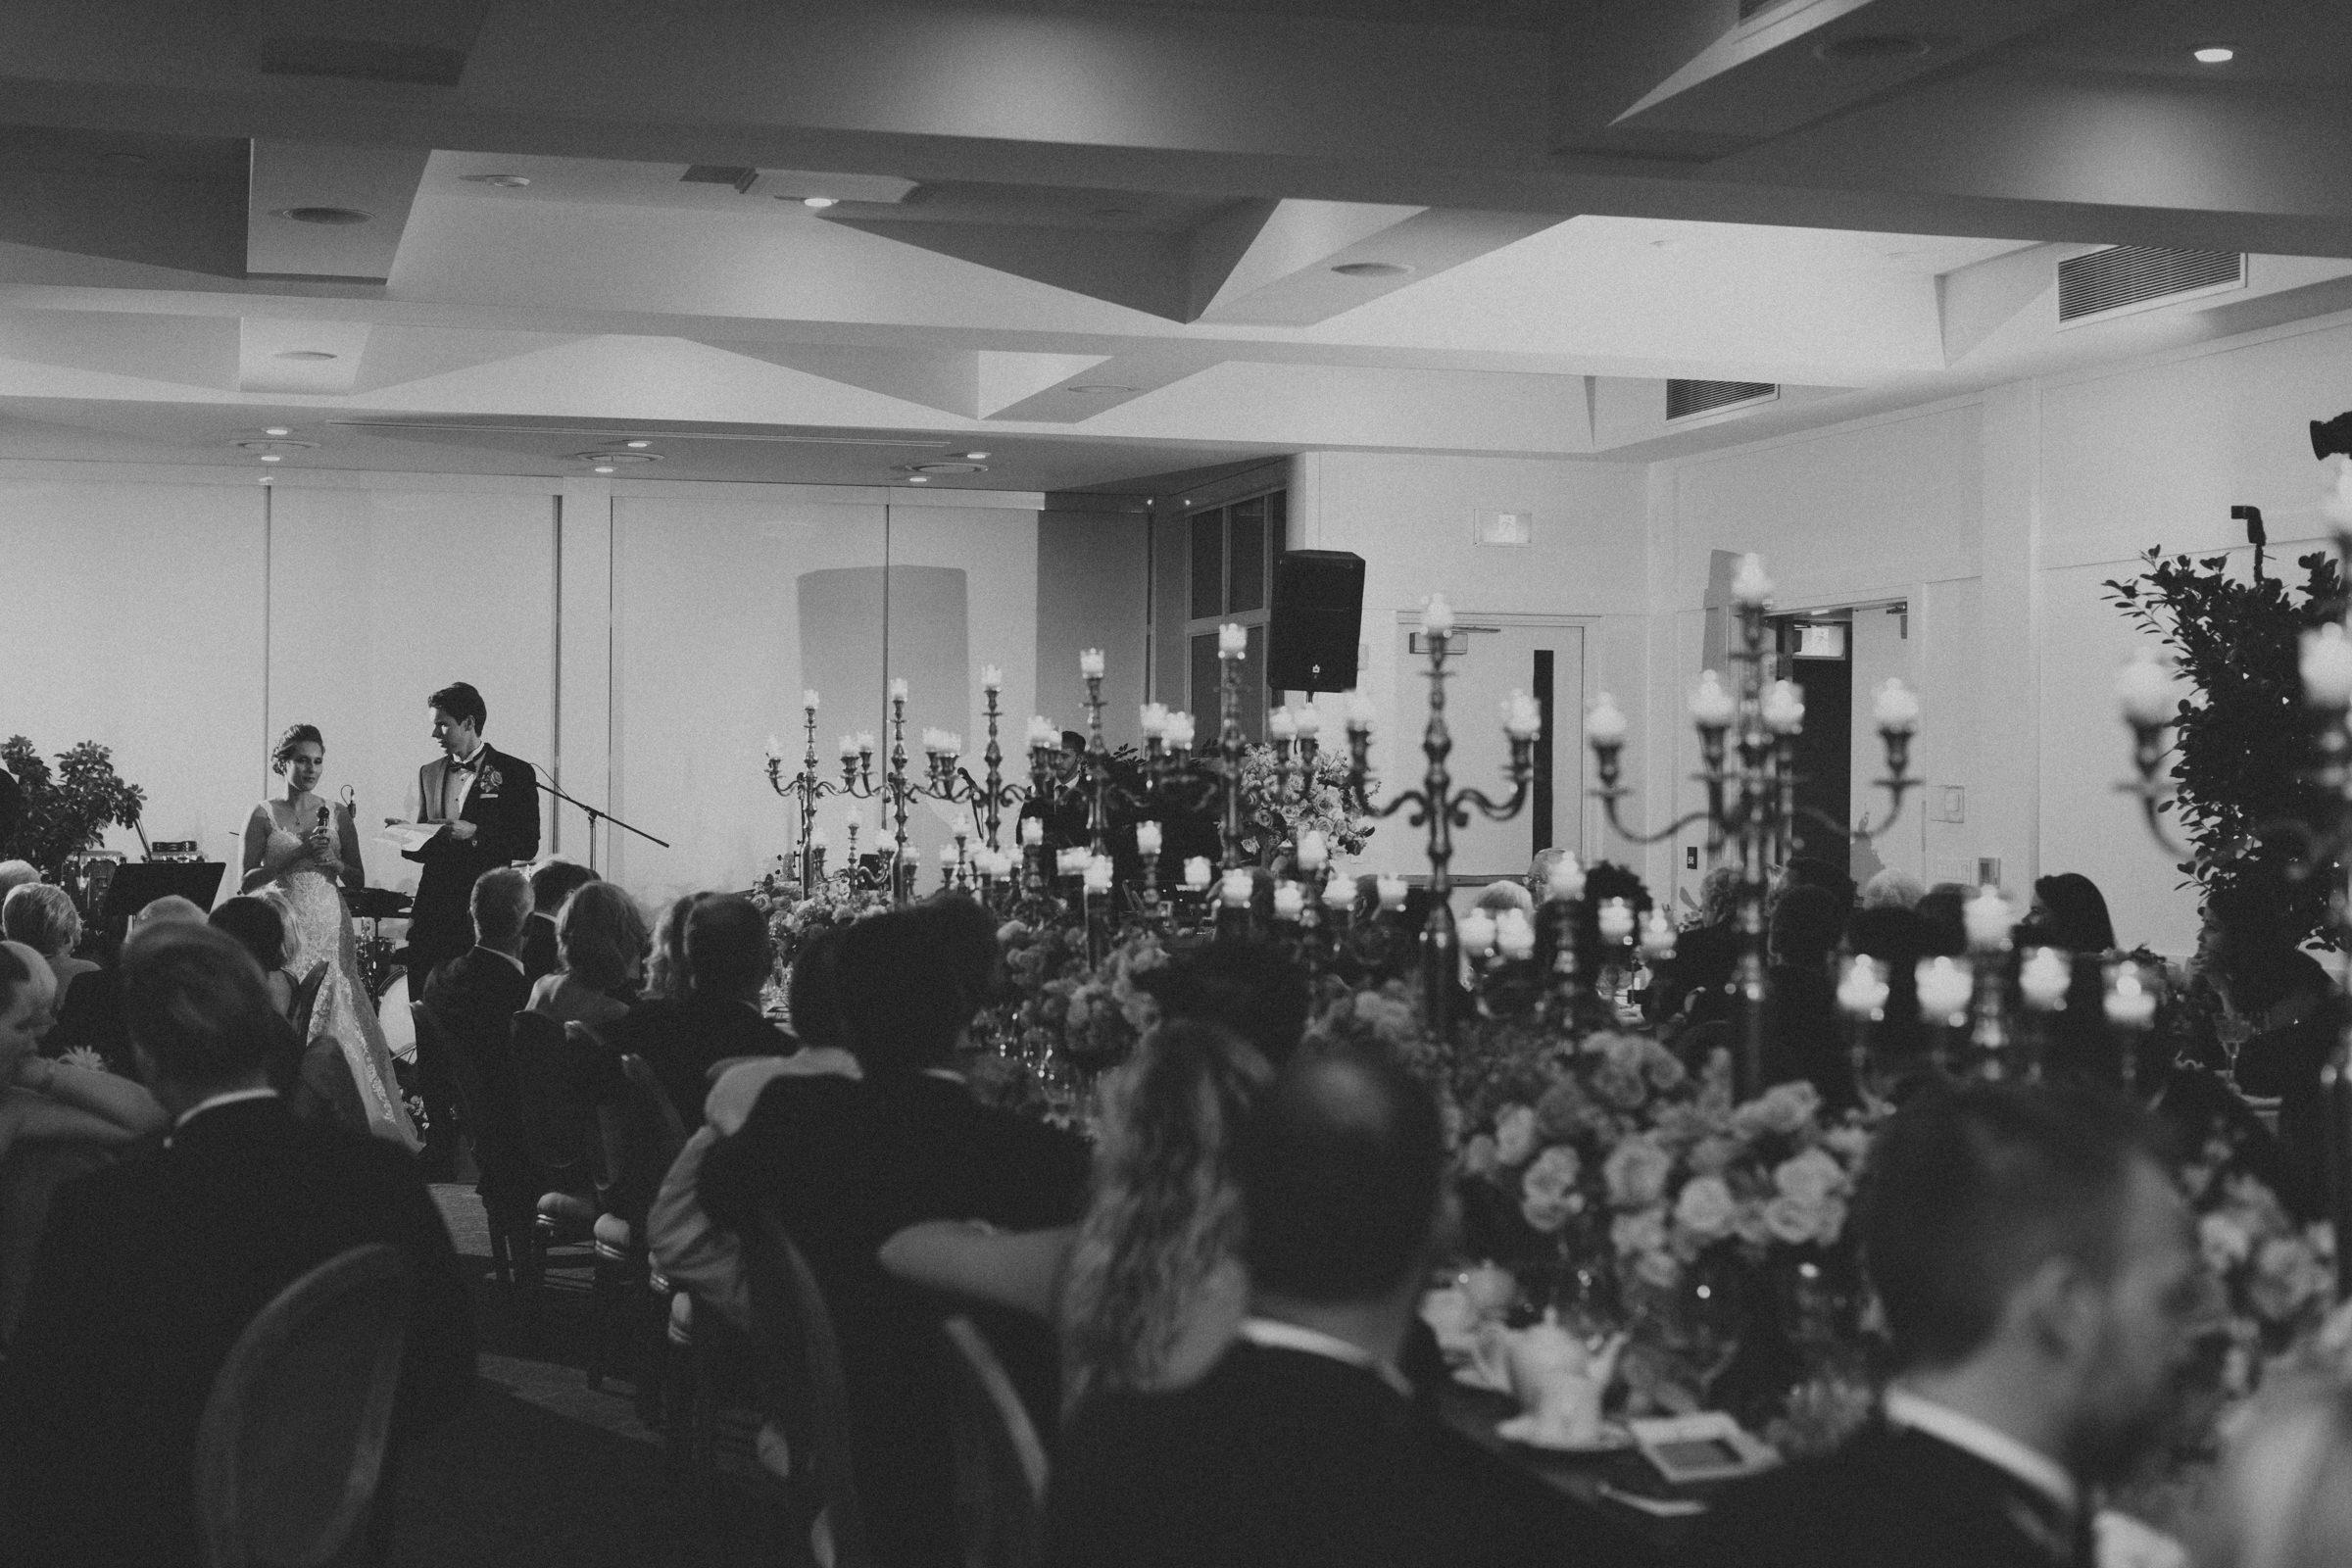 Langdon-Hall-wedding-photography-Cambridge-by-Sam-Wong-of-Visual-Cravings_Sarah-Ryan_55.jpg